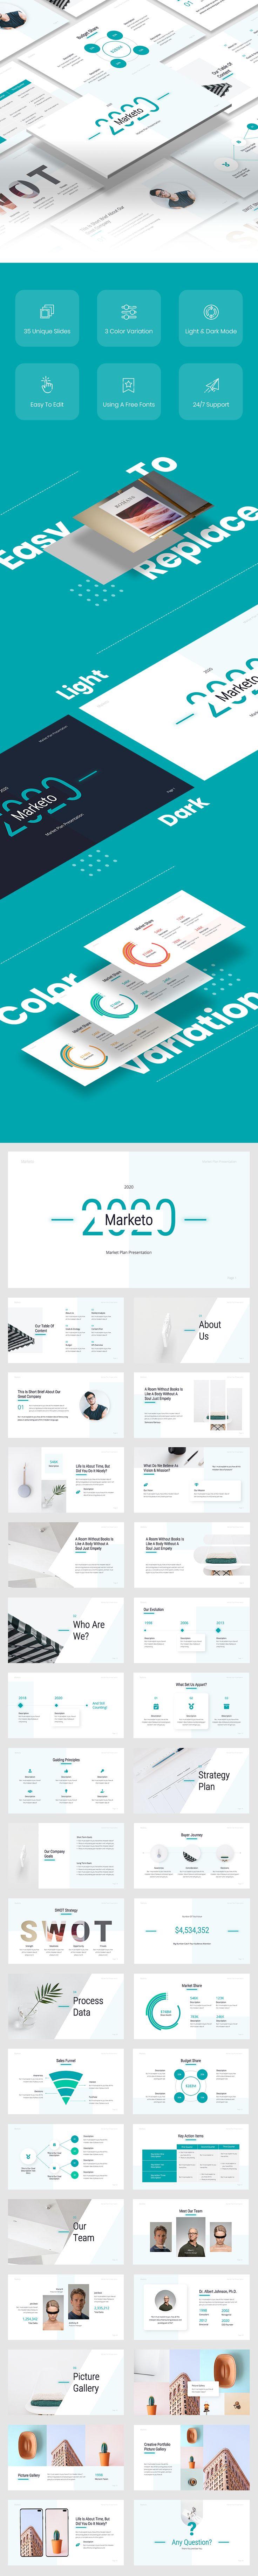 Marketo - Marketing Google Slide